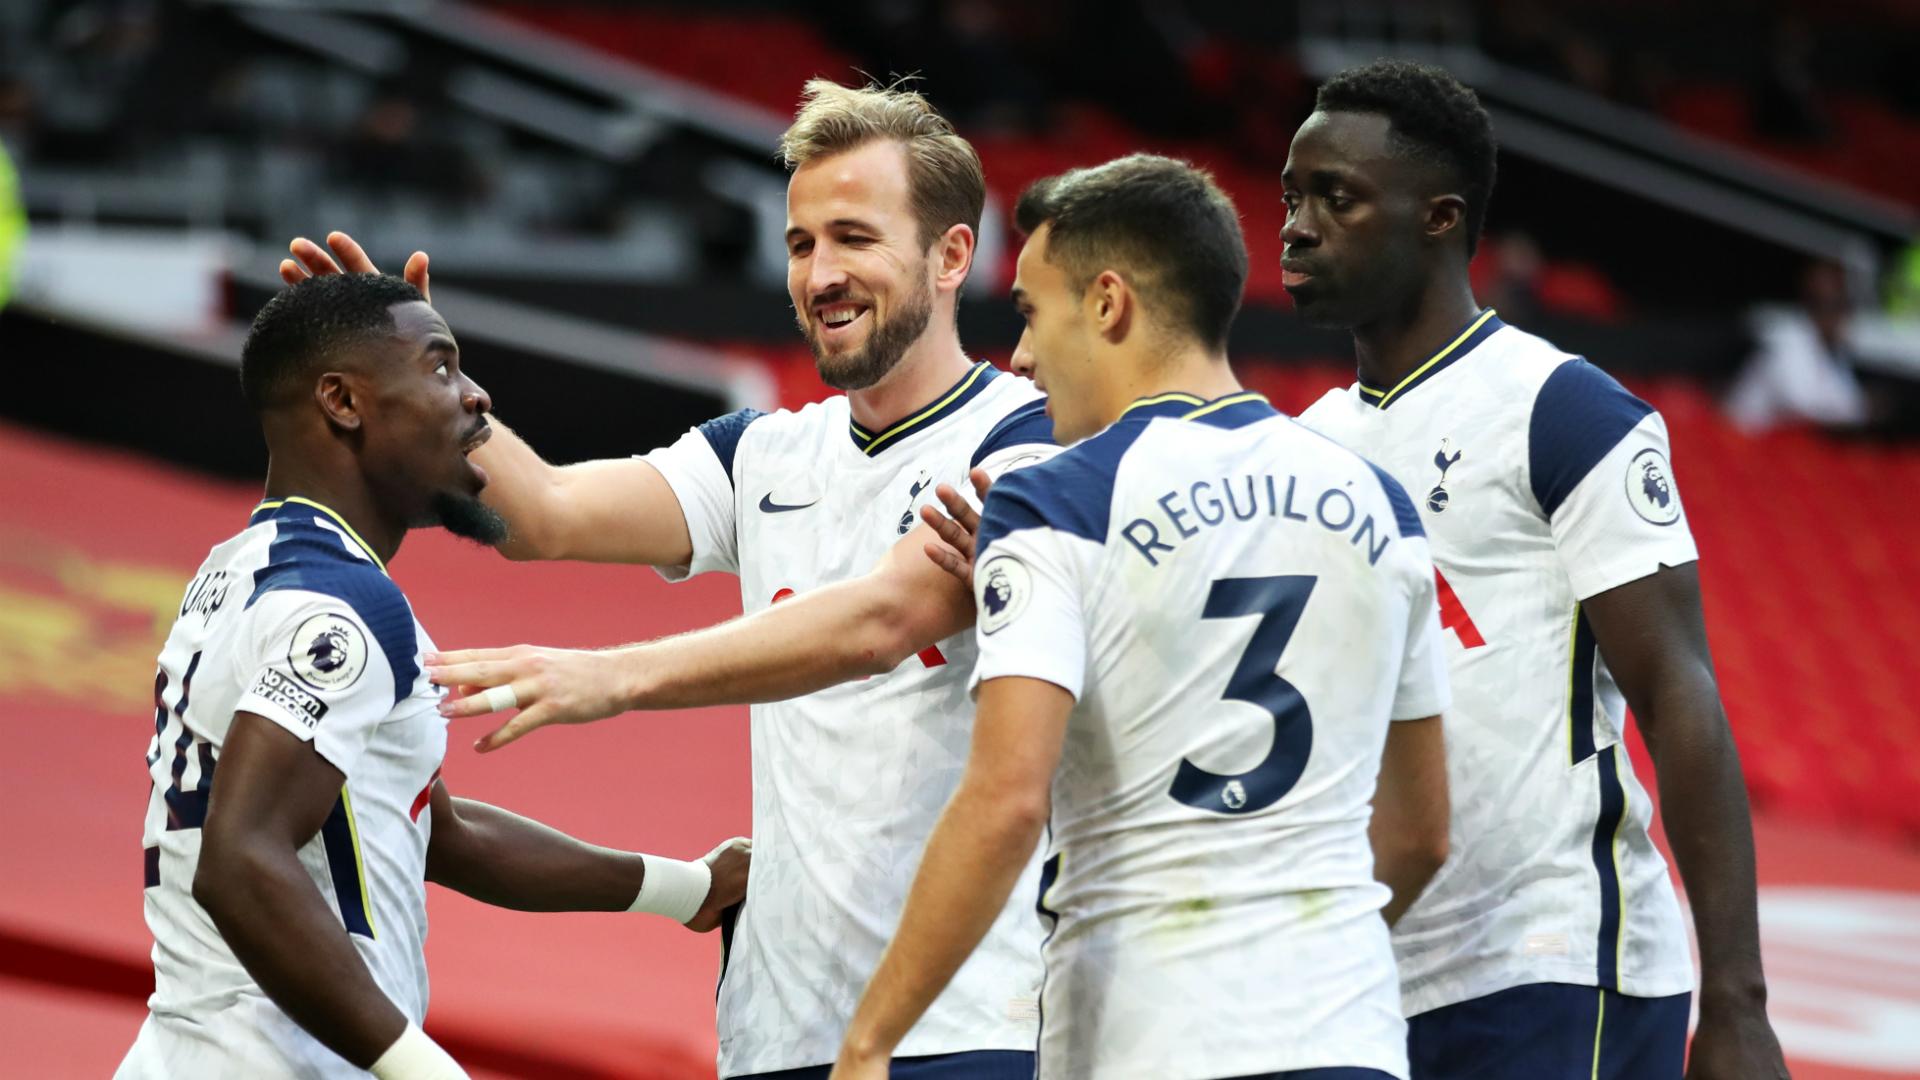 Manchester United V Tottenham Hotspur Match Report 04 10 20 Premier League Goal Com